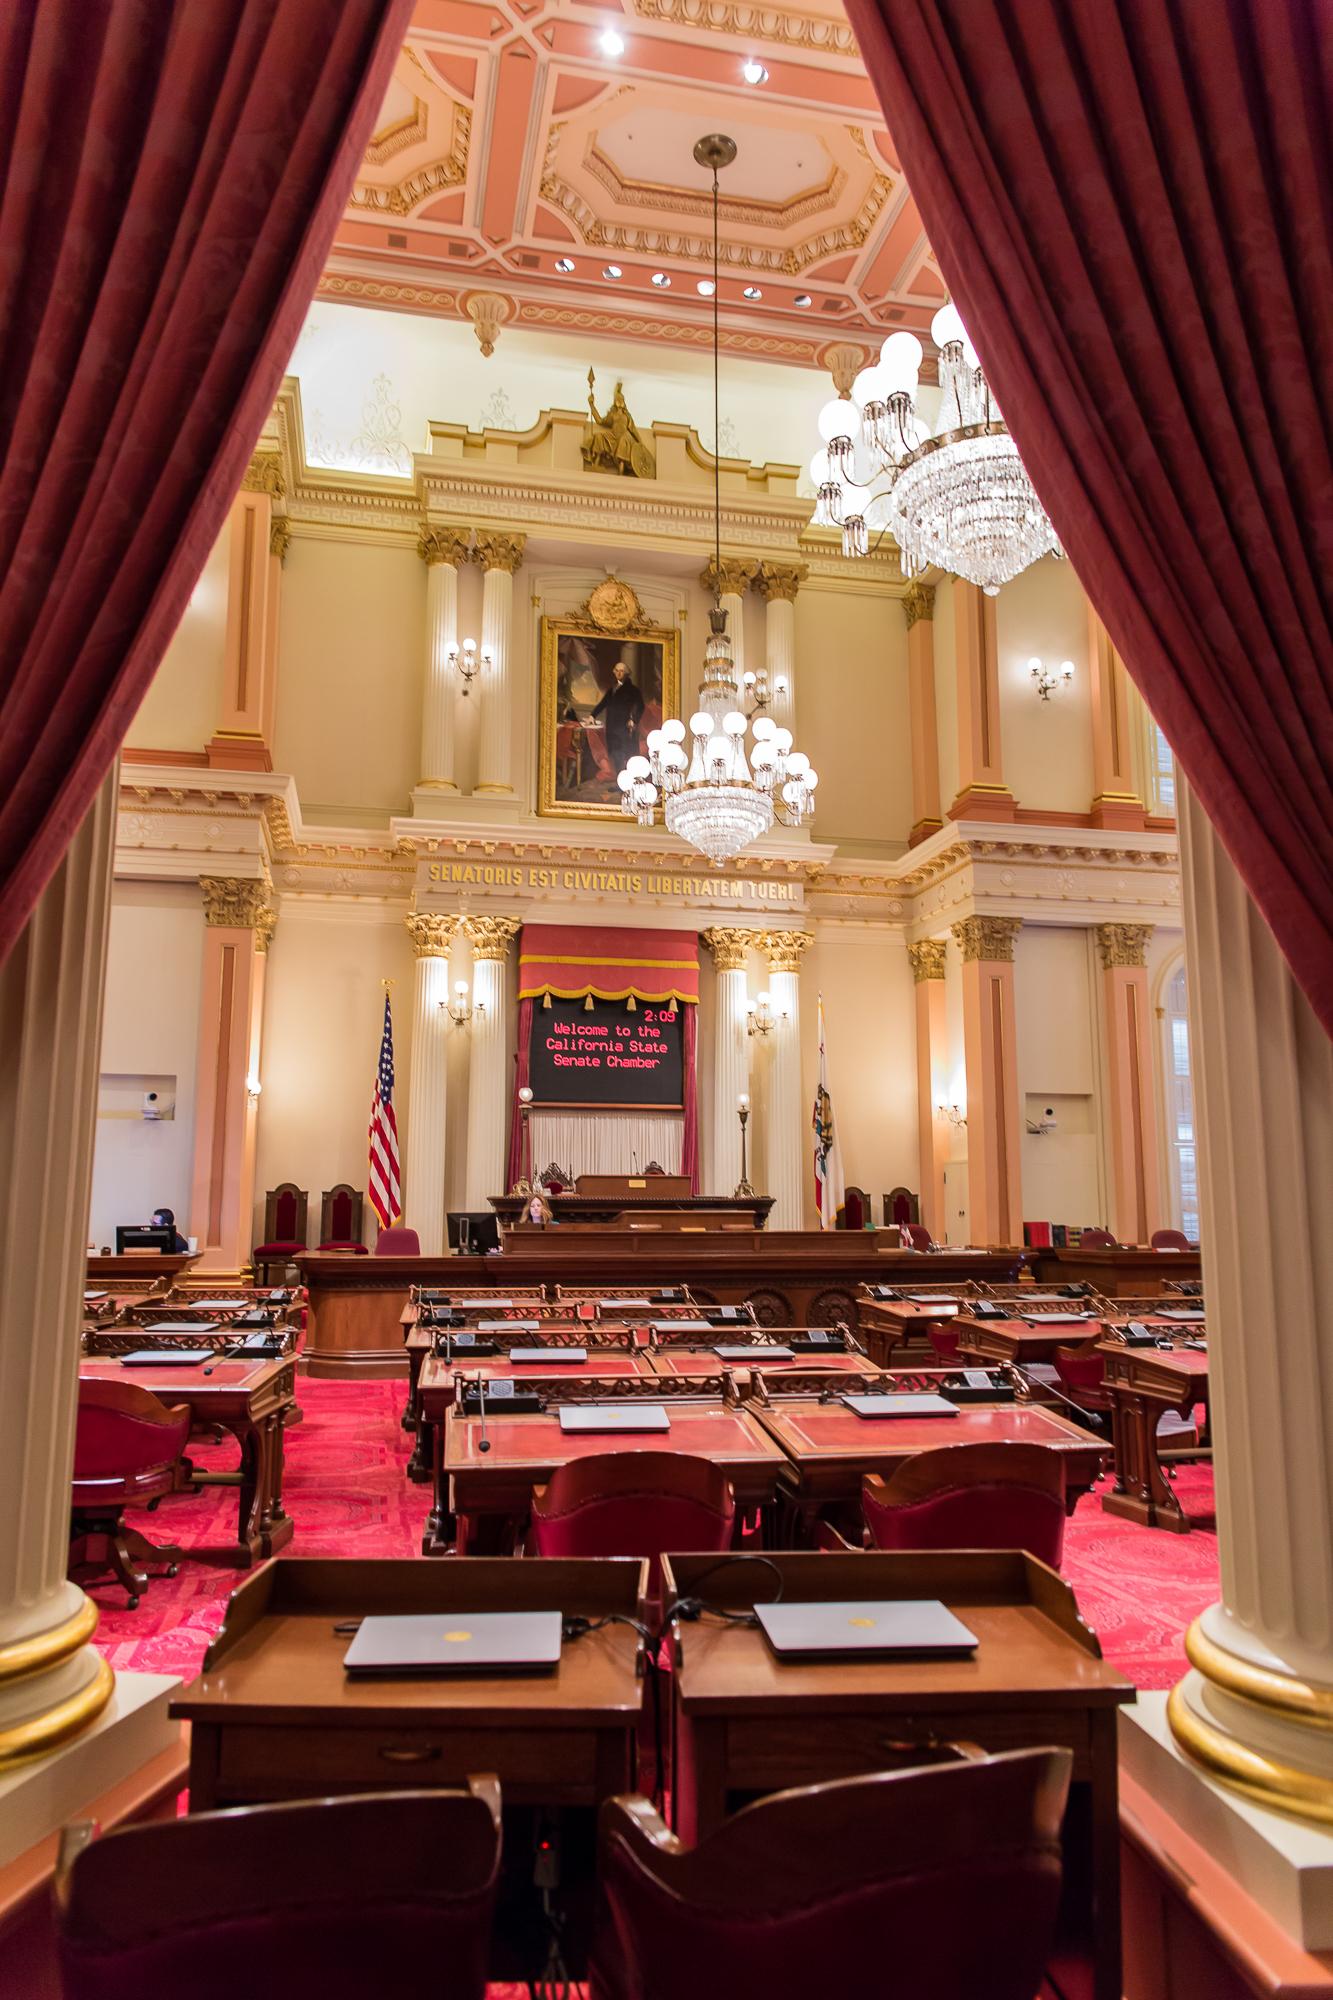 California State Senate - Red represents nobility